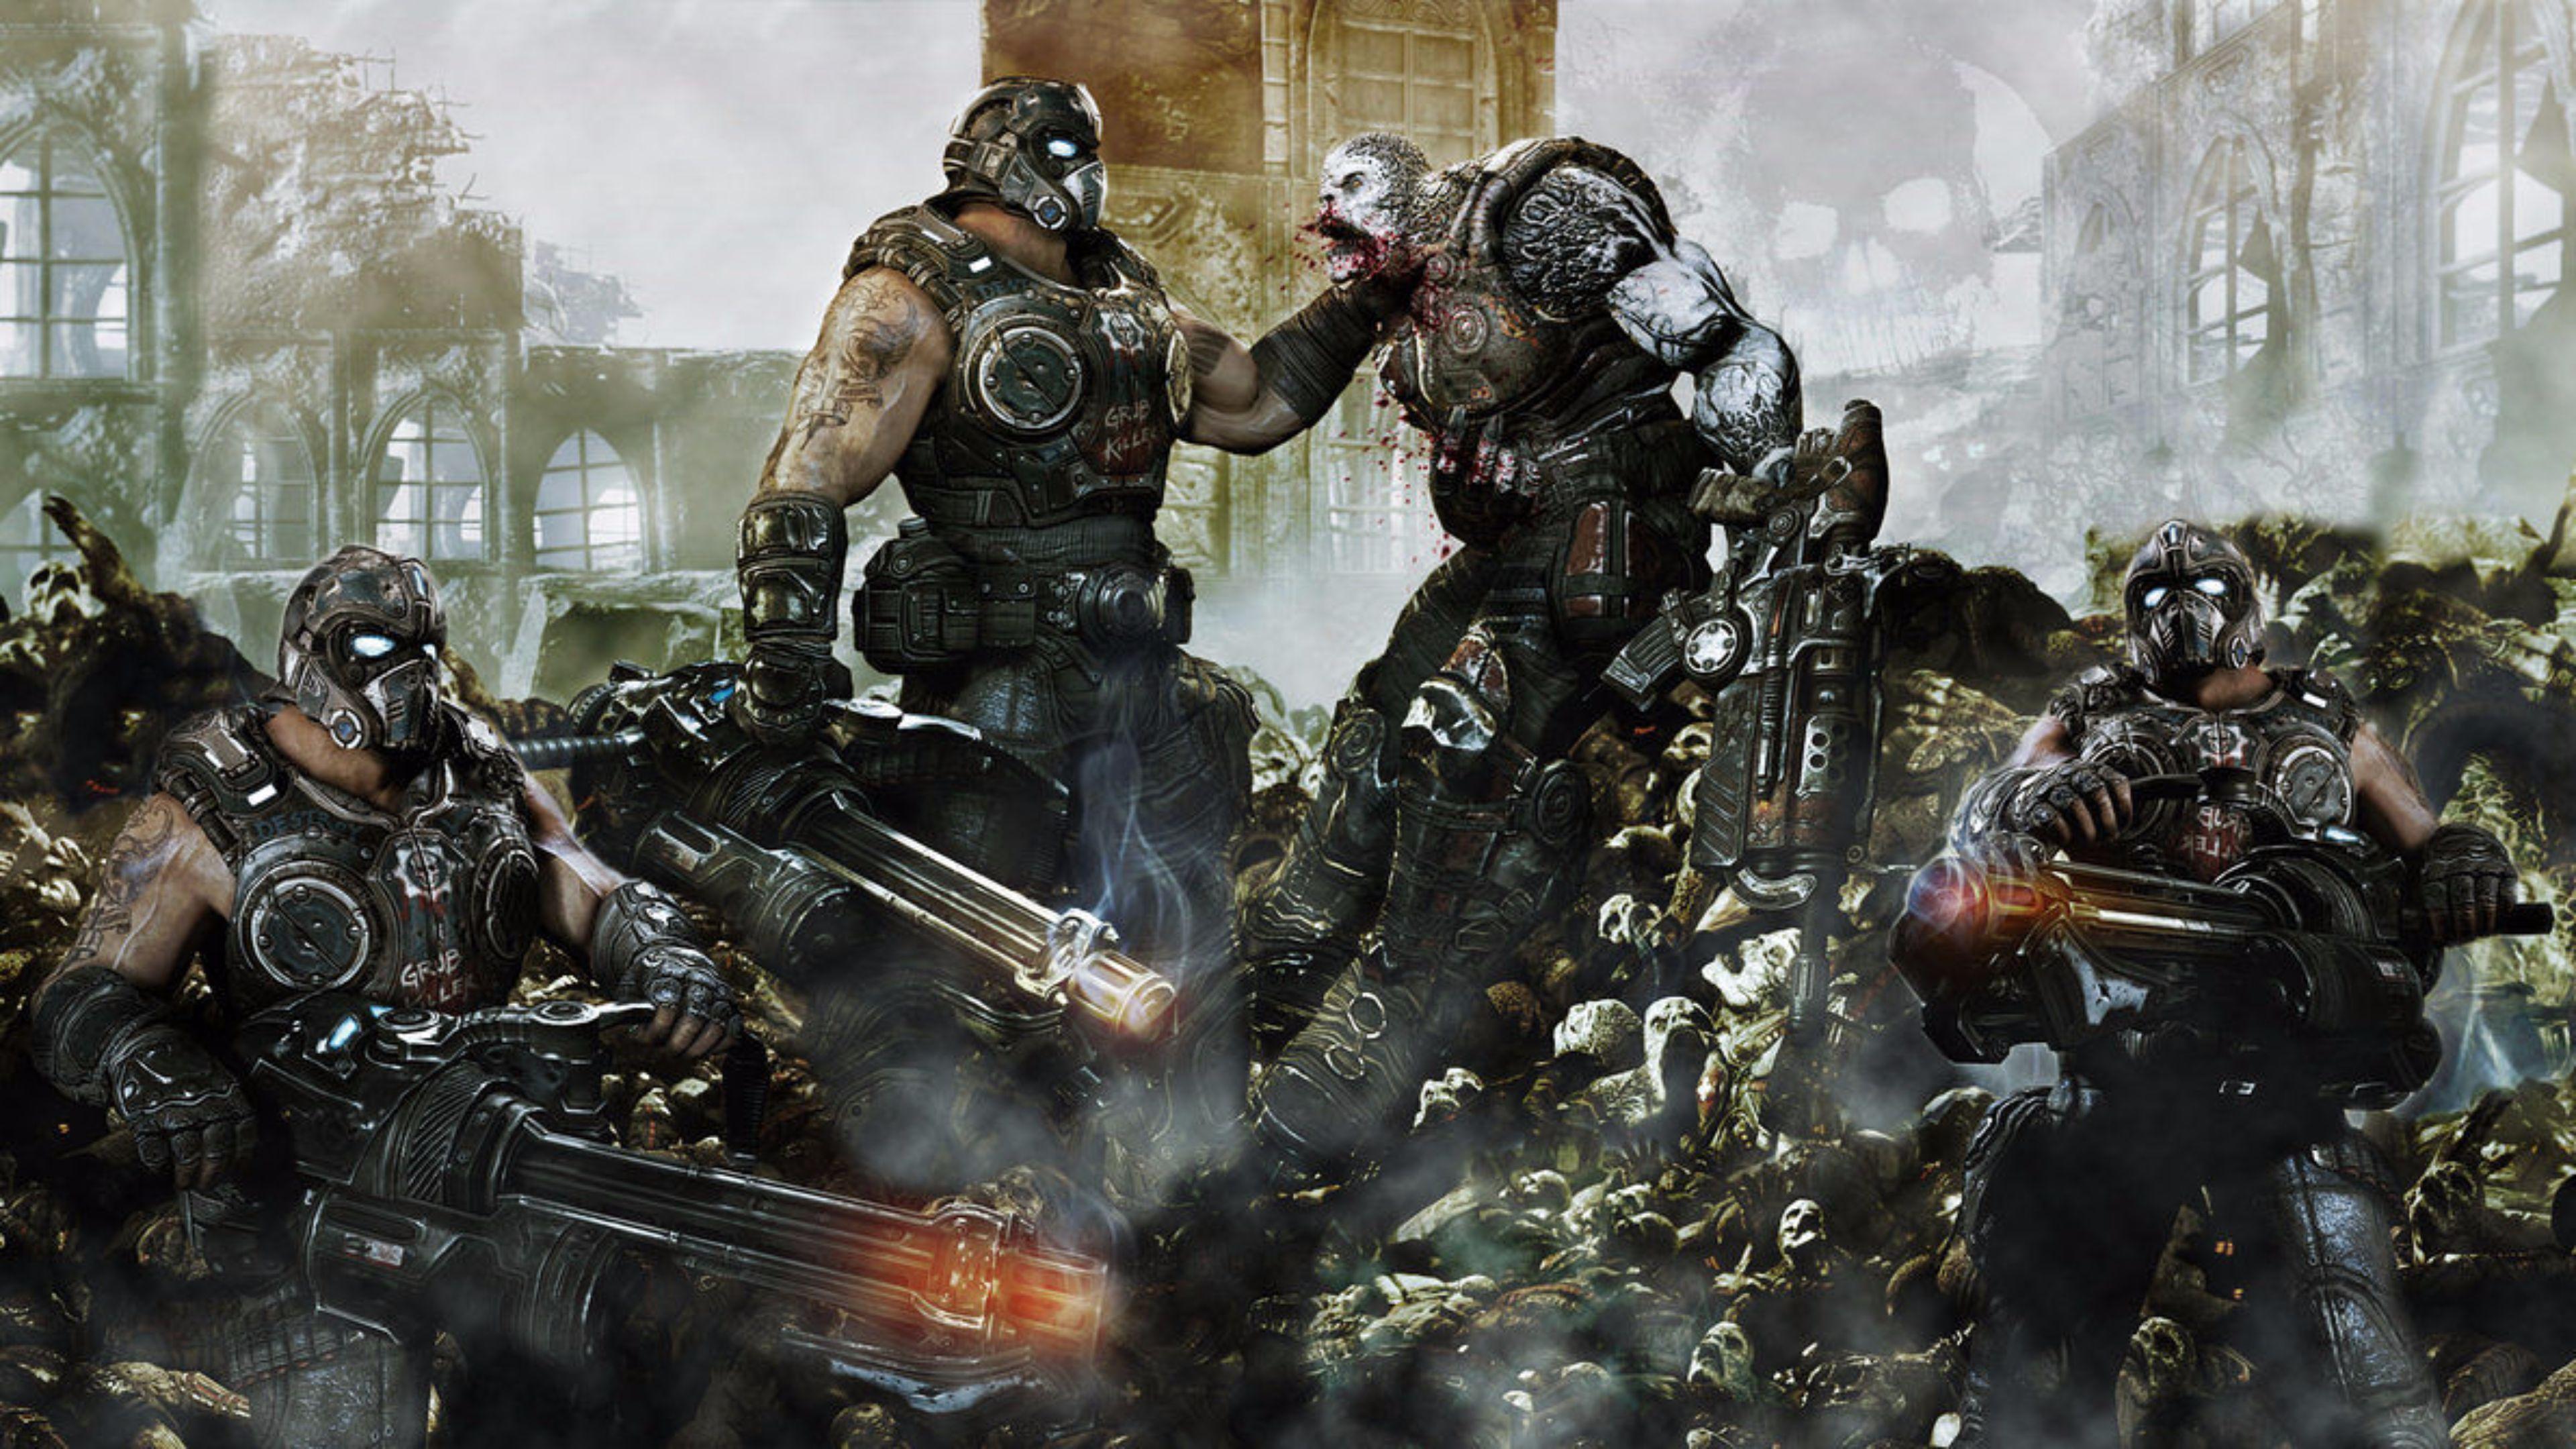 Gears Of War 4 Wallpaper Photo Click Wallpapers Gears